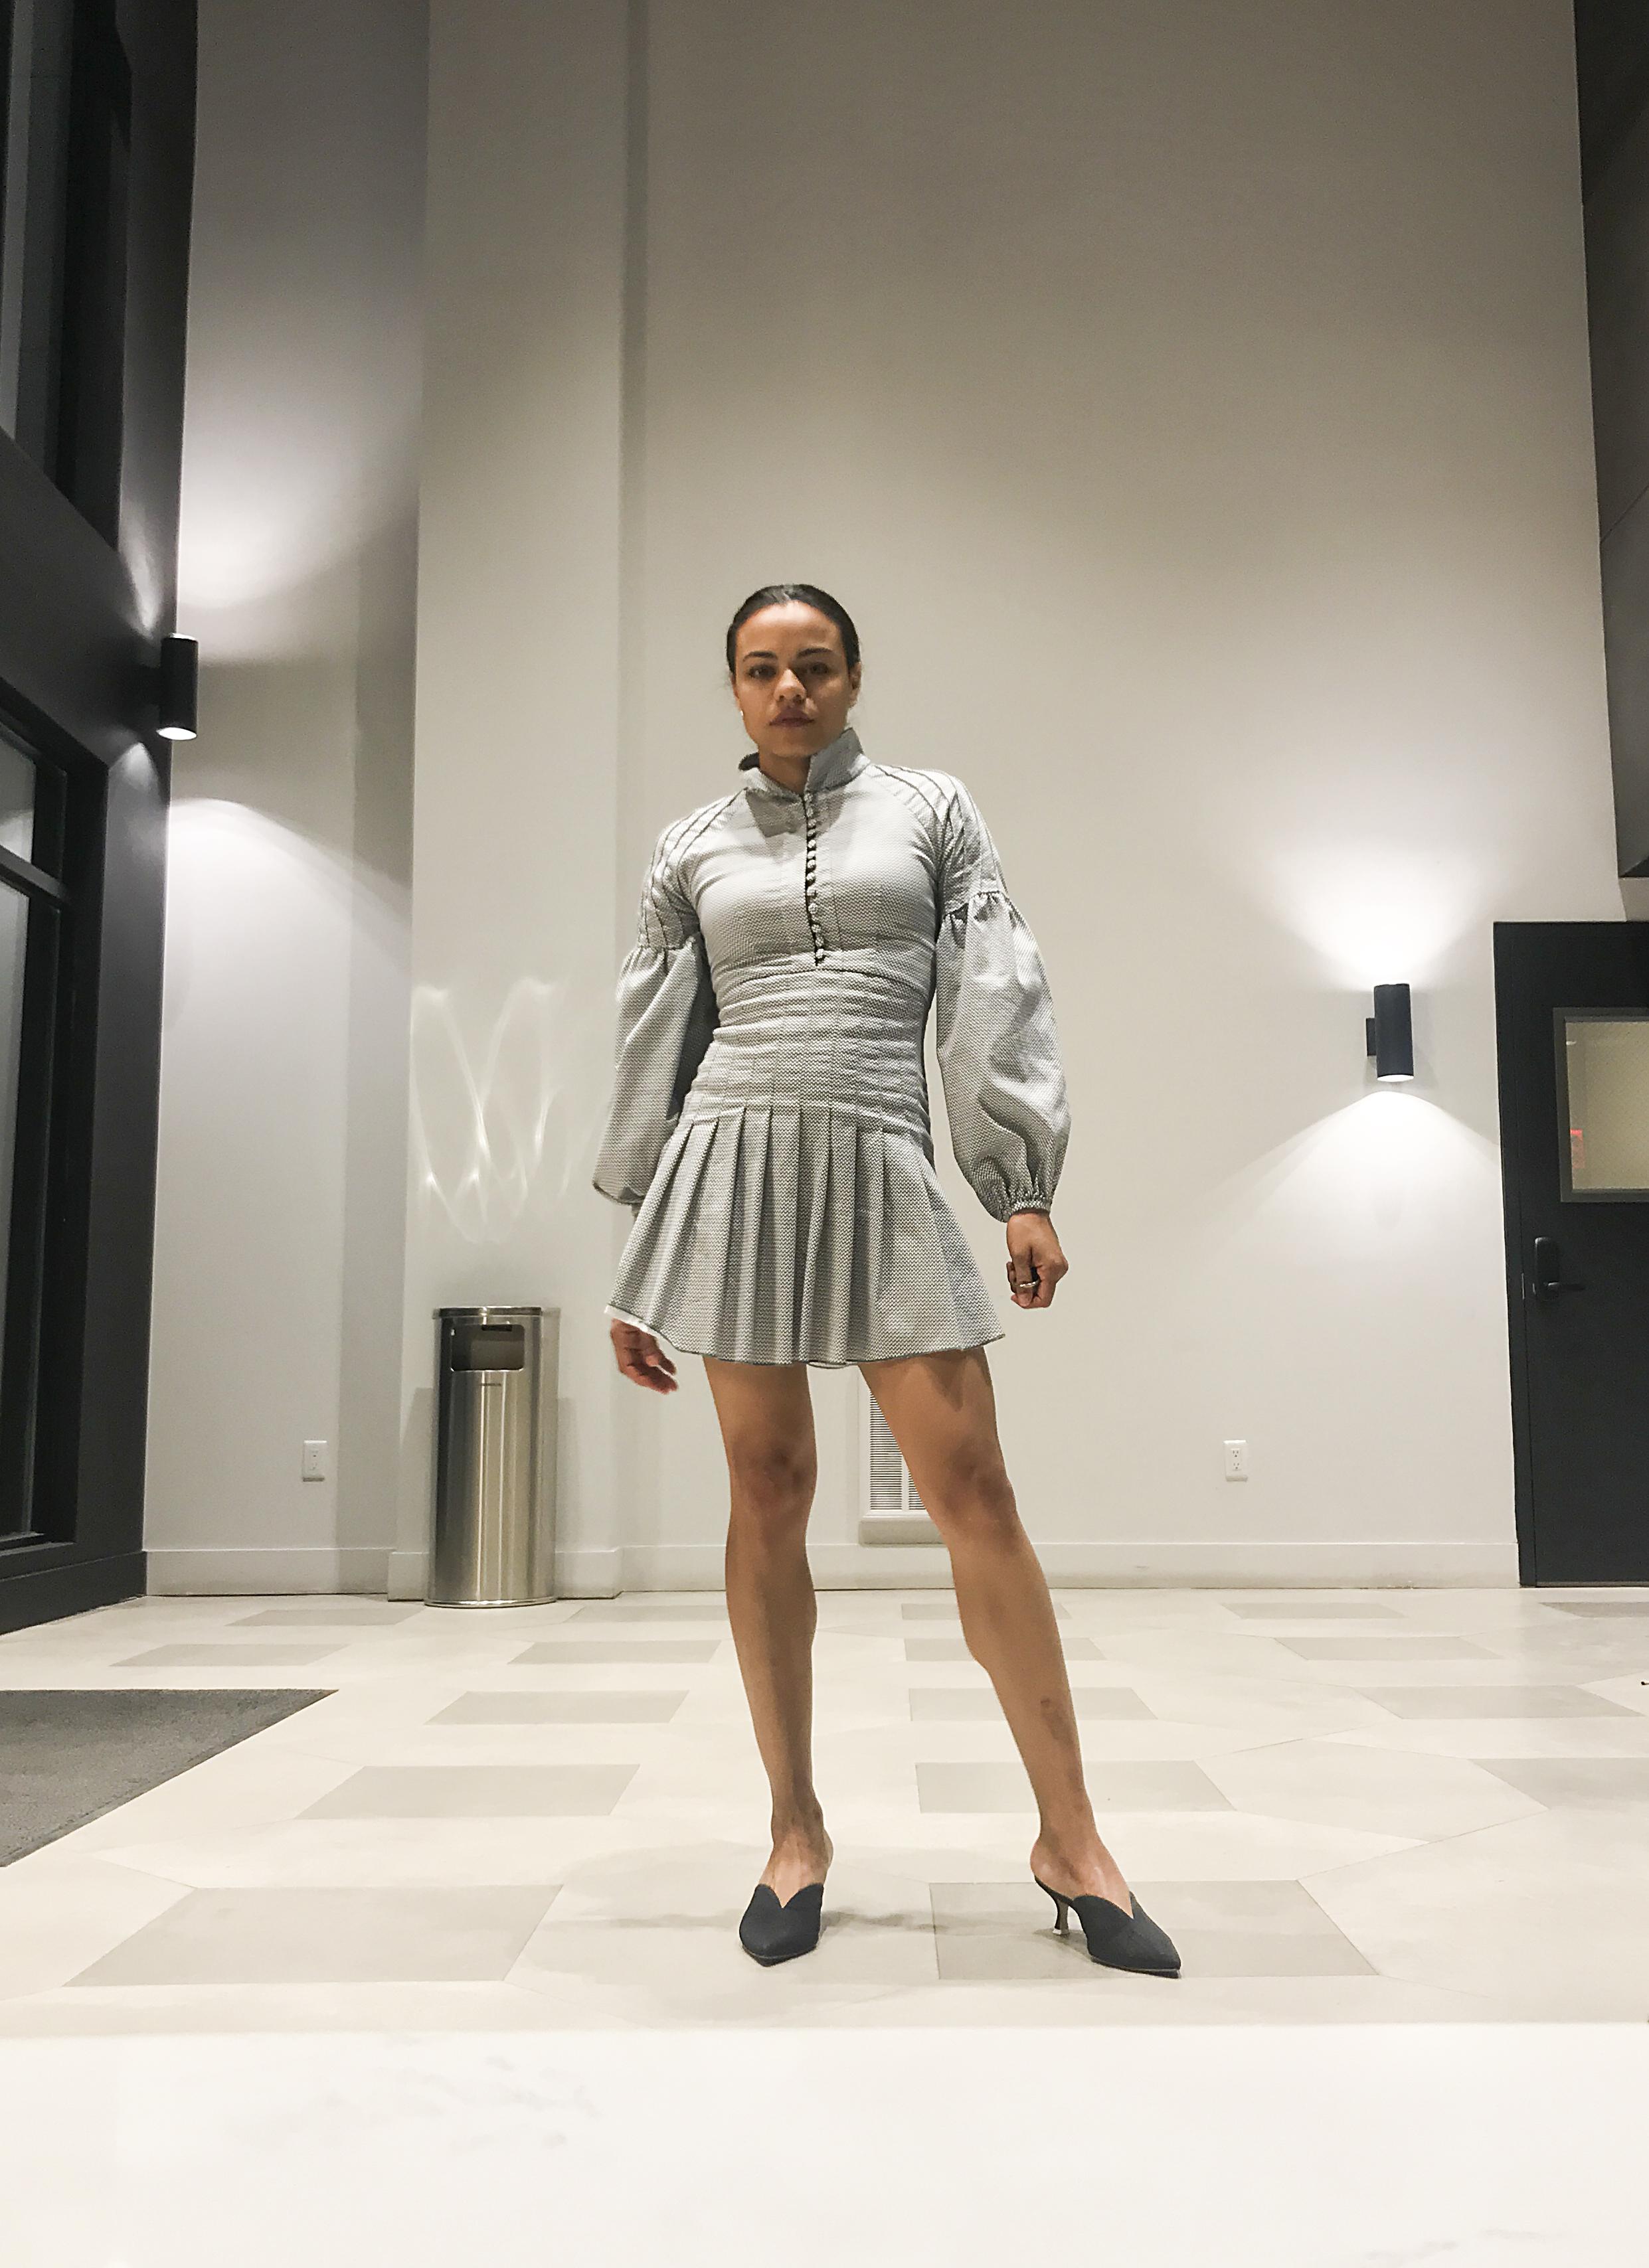 Dress: C/MEO Collective. Shoes: Attico